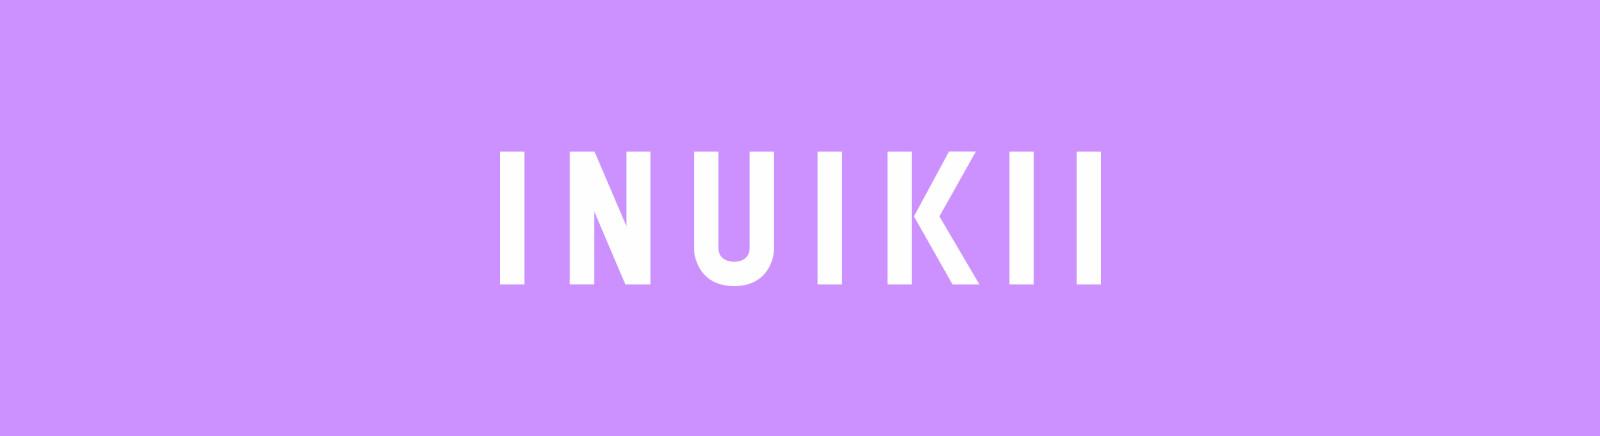 Juppen: INUIKII/IKKII Winterboots für Damen online shoppen